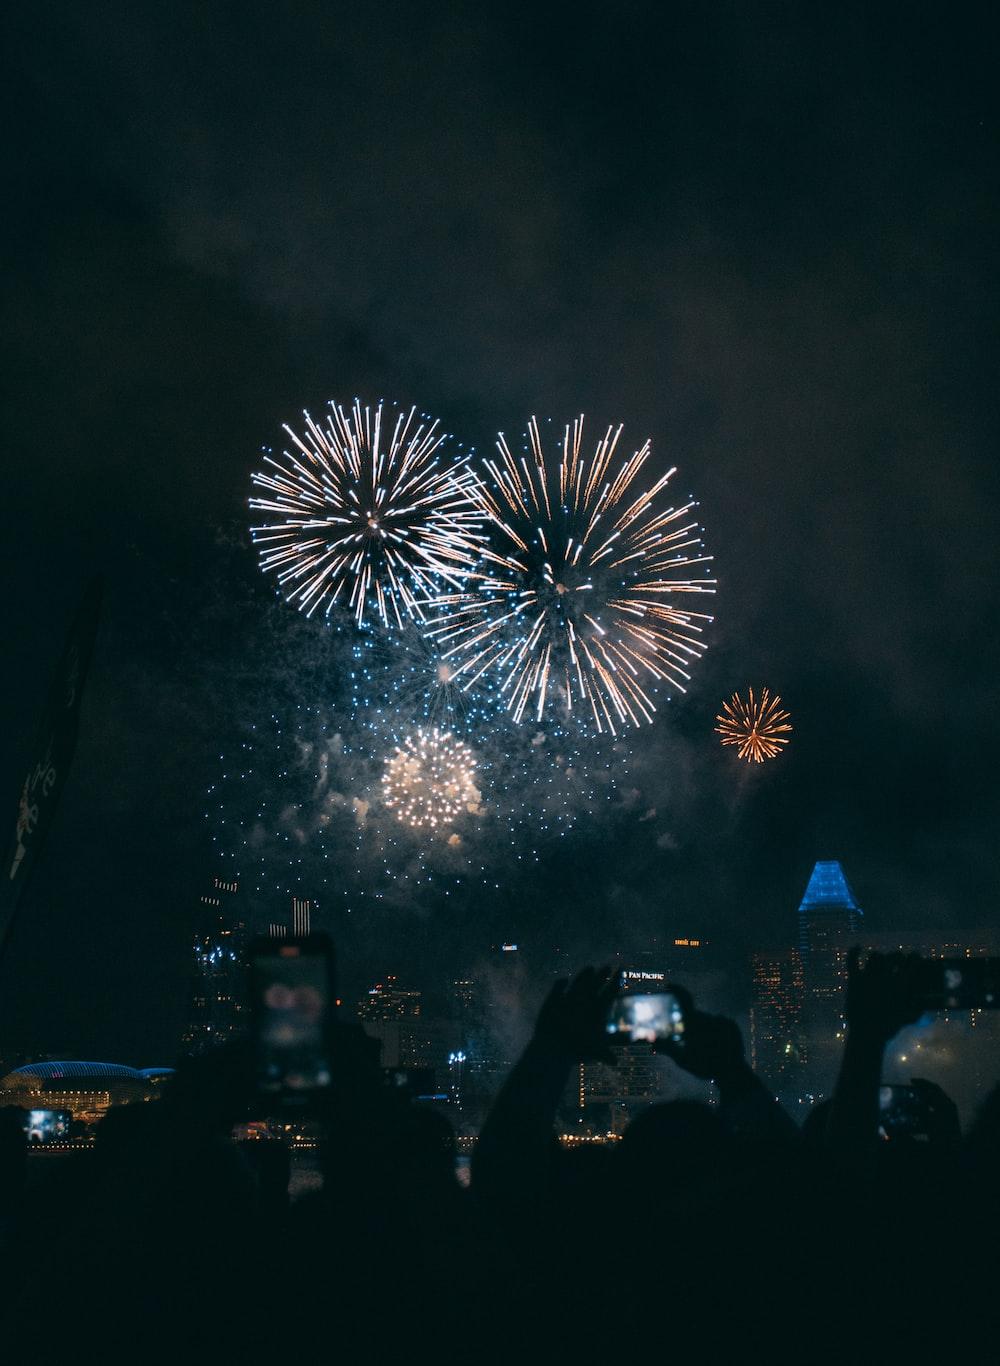 people watching fireworks display during night time